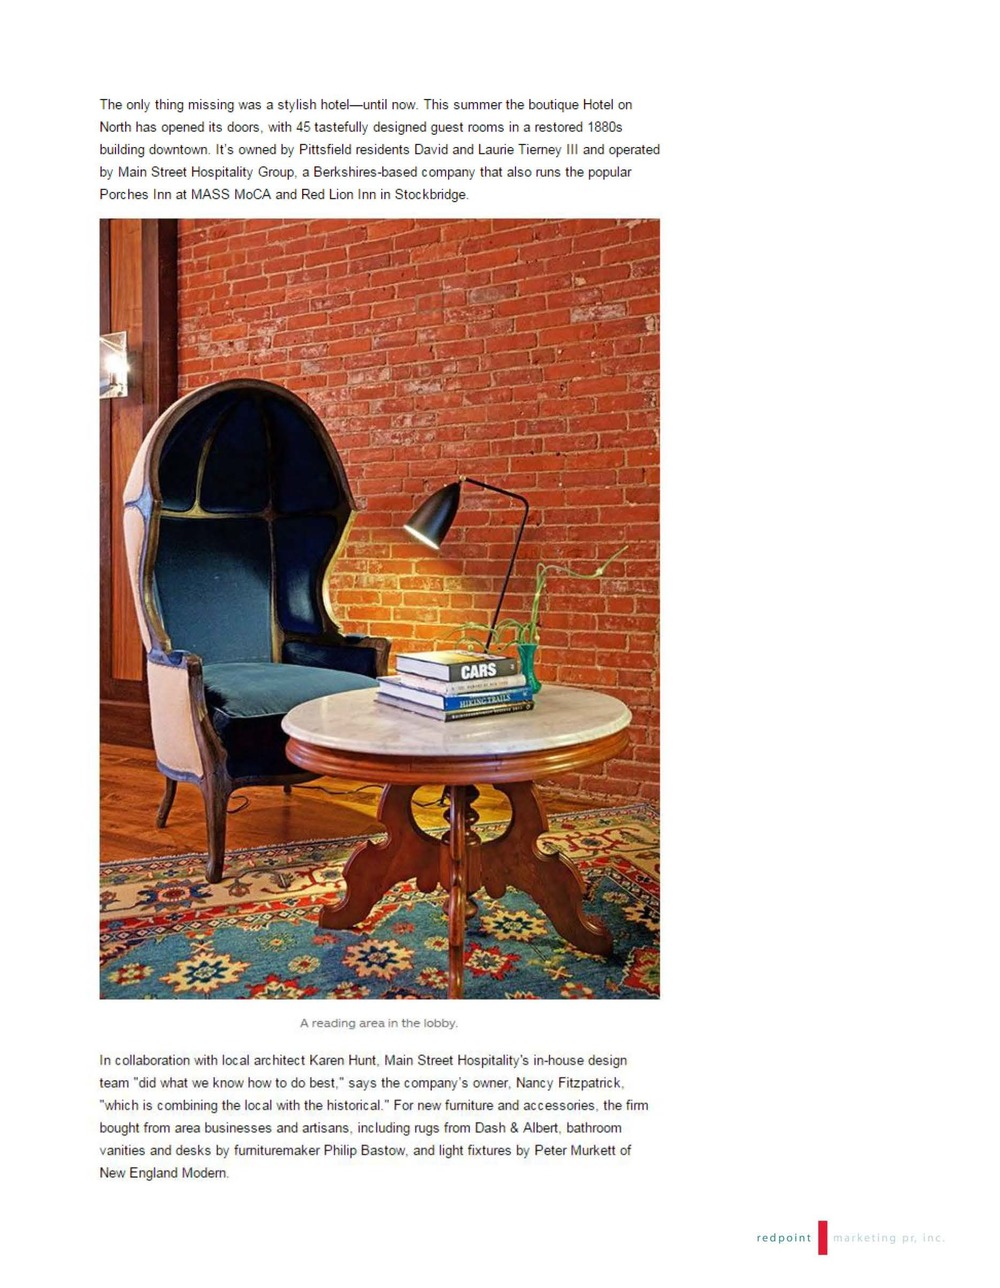 HON_ArchitecturalDigest.com 8.28.15_Page_2.jpg